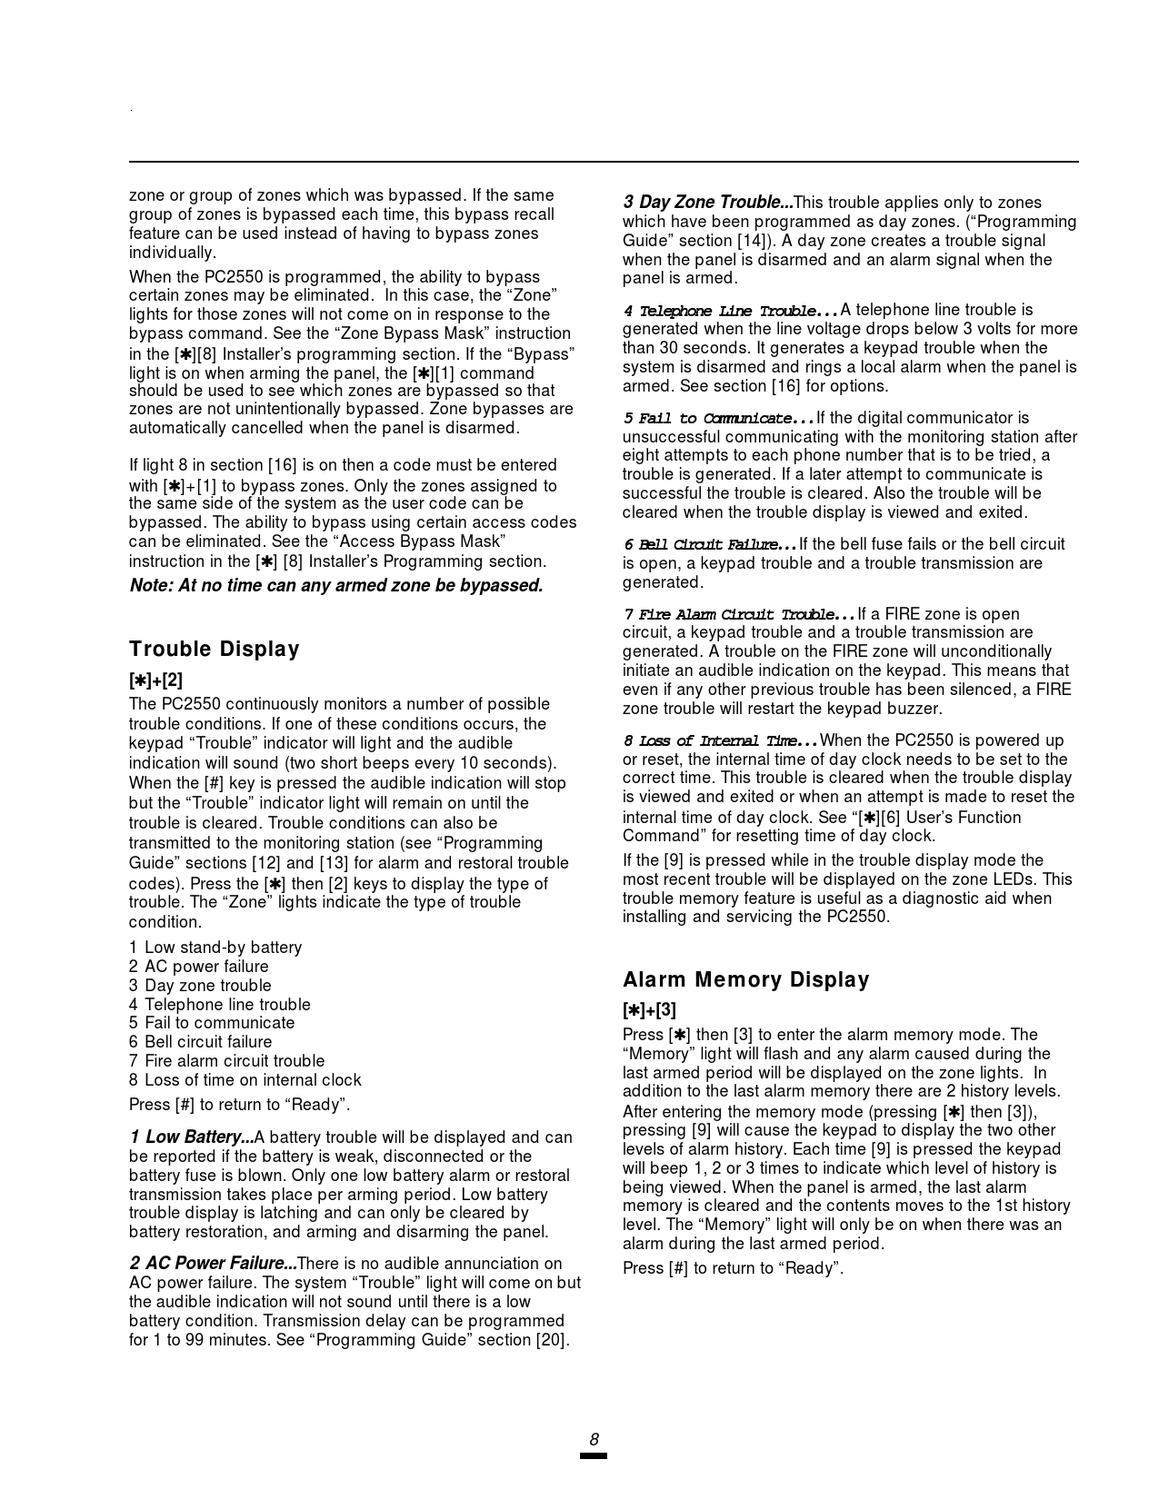 DSC pc2550 v1-3 im eng 29000592 r2 by Sertek Servicios Tecnologicos ...